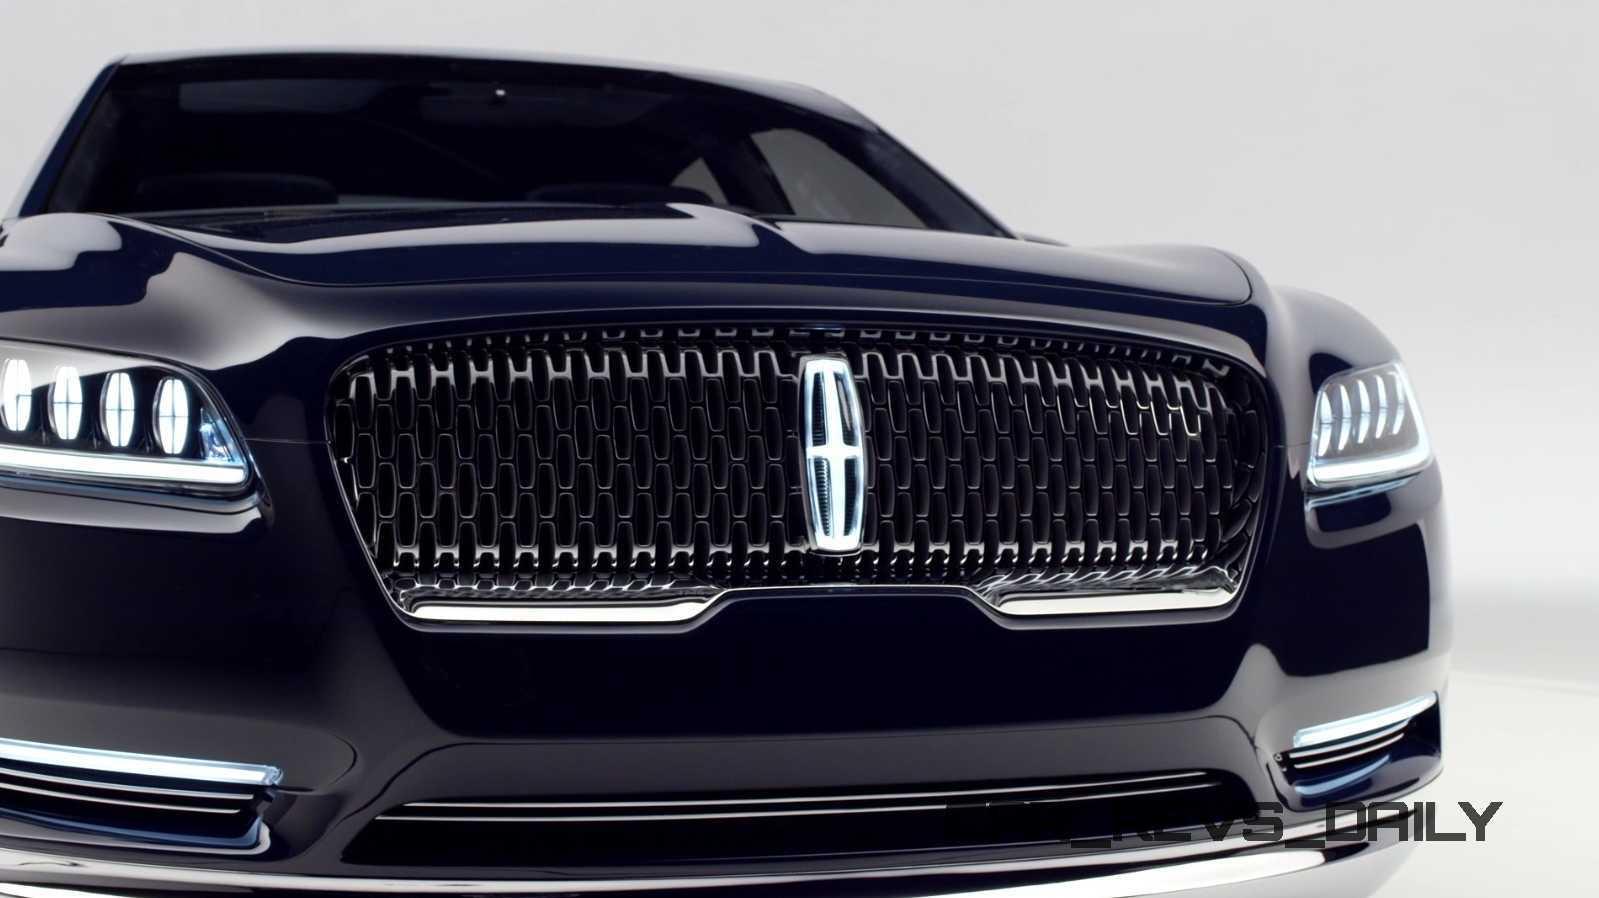 2015 Lincoln Continental Concept